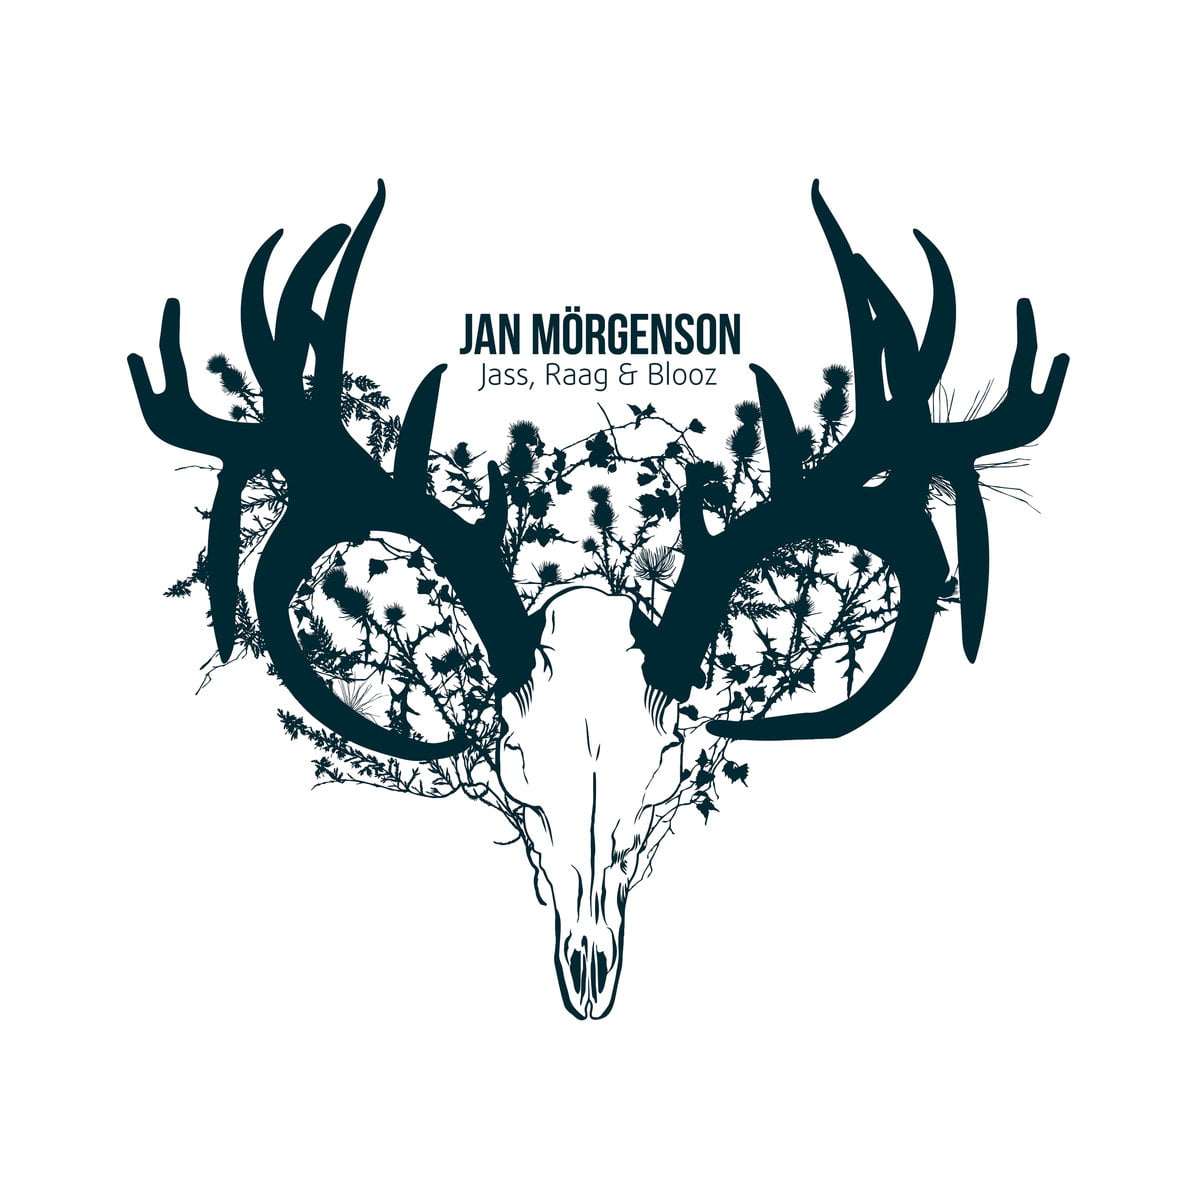 Jan Mörgenson | Jass, Raag & Blooz